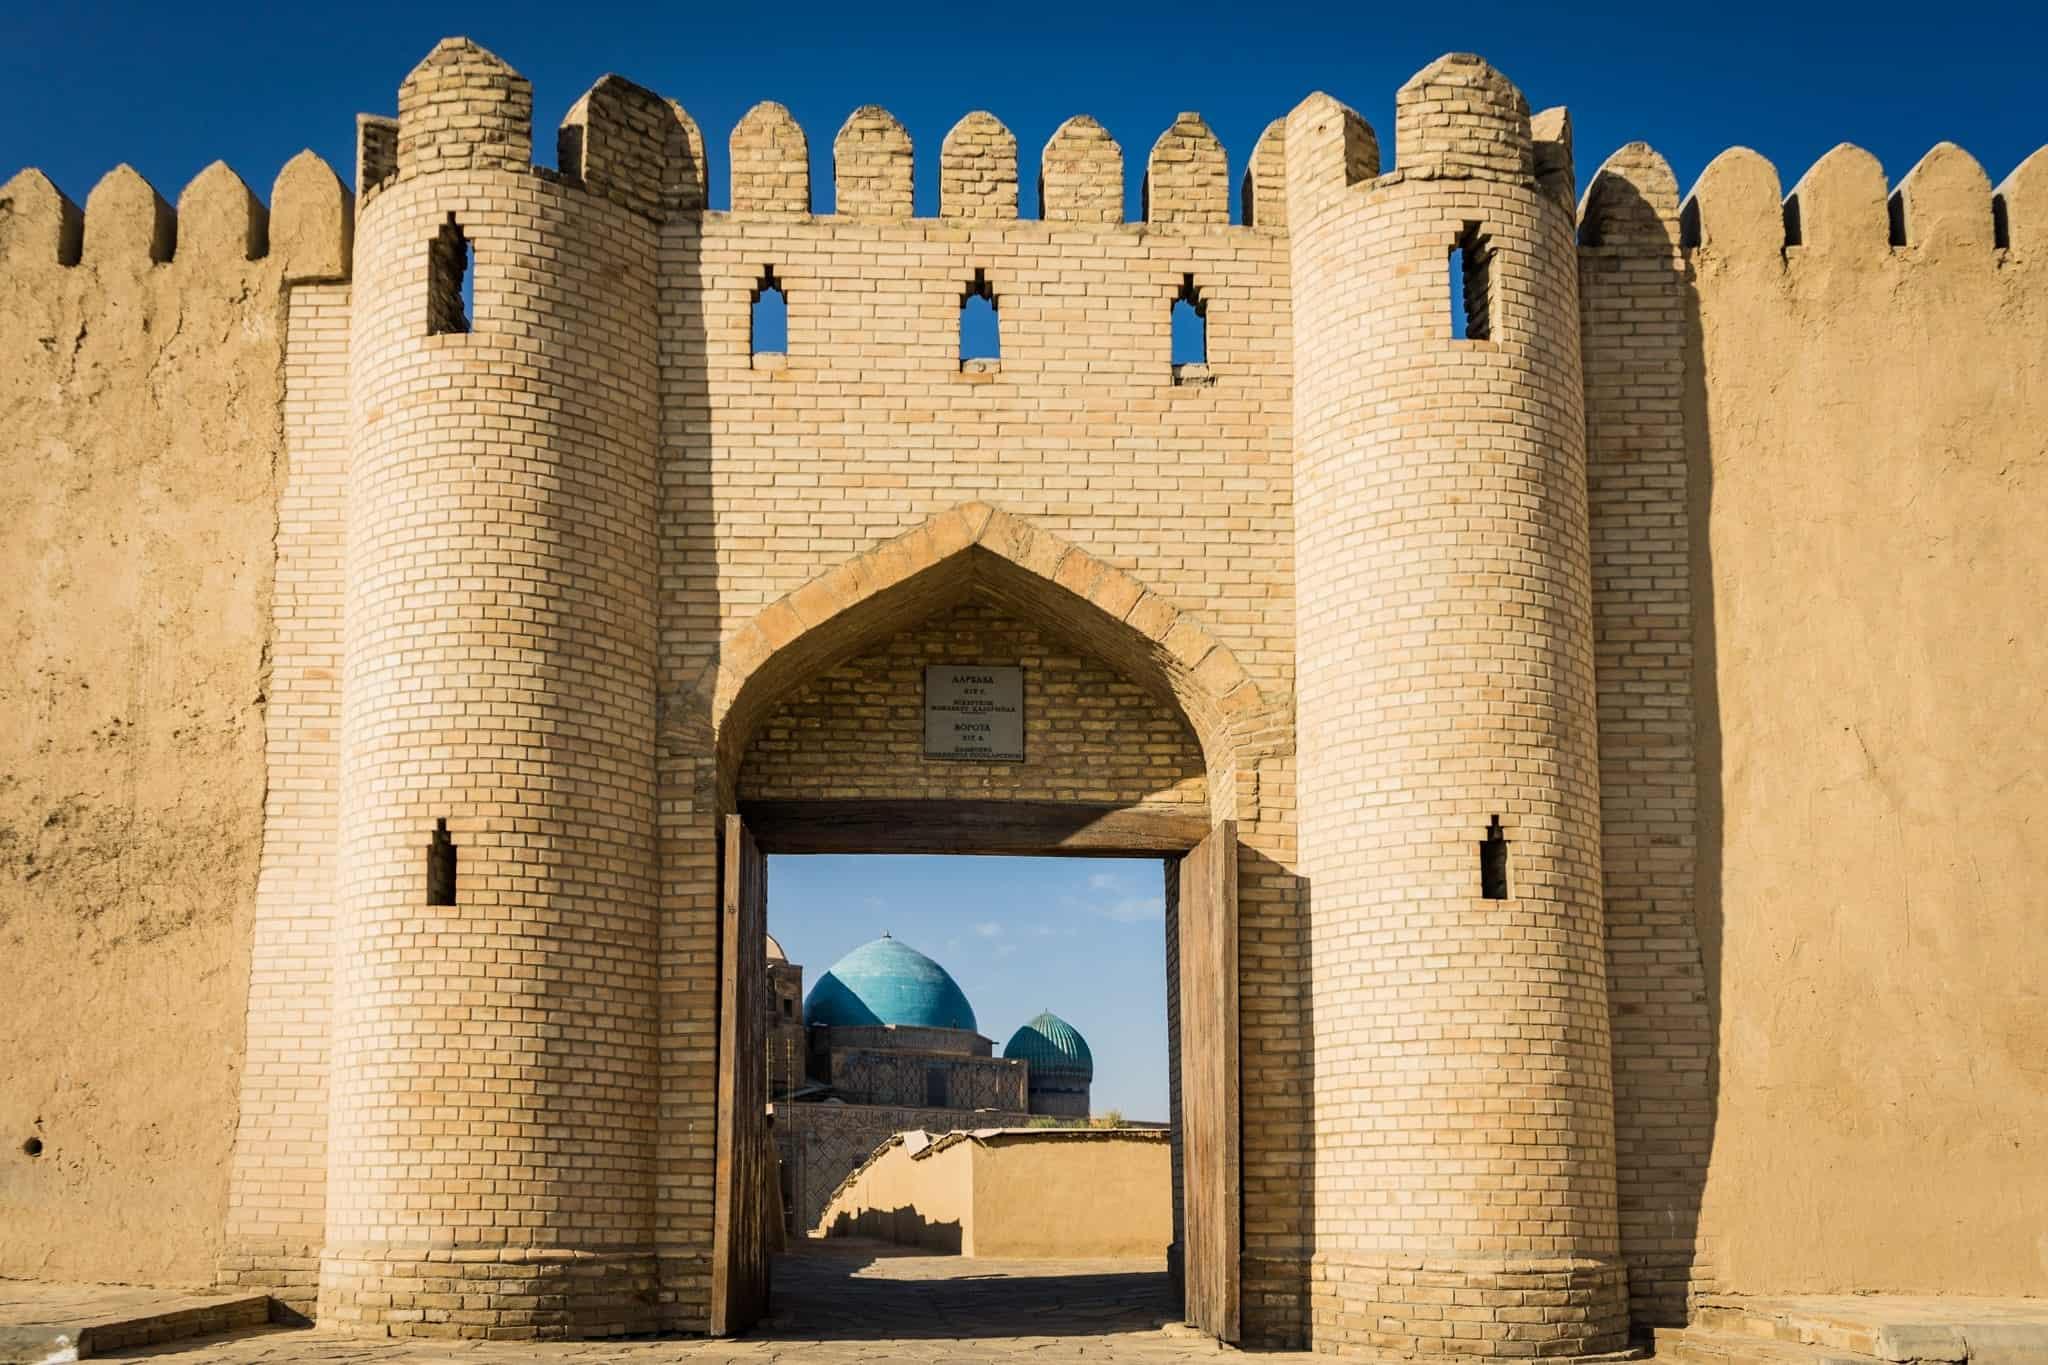 Turkistan he Mausoleum of Khawaja Ahmed Yasawi Gate